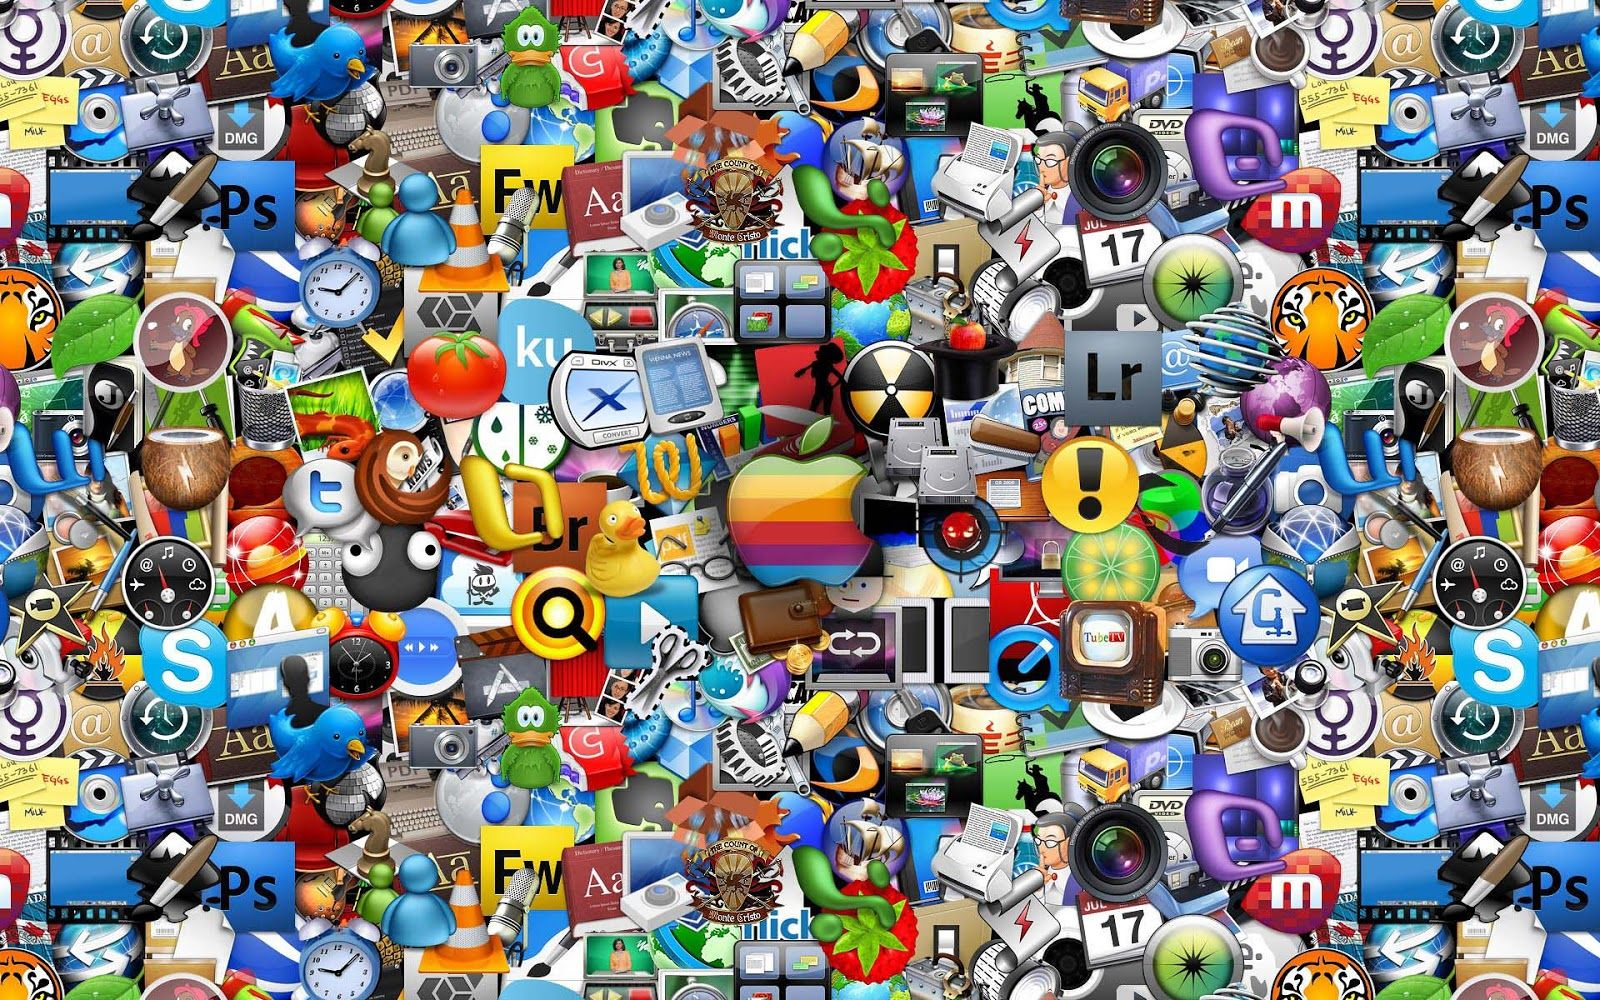 Wallpaper download app for iphone - Phone Apps Google Play App Store Foto Wallpaper